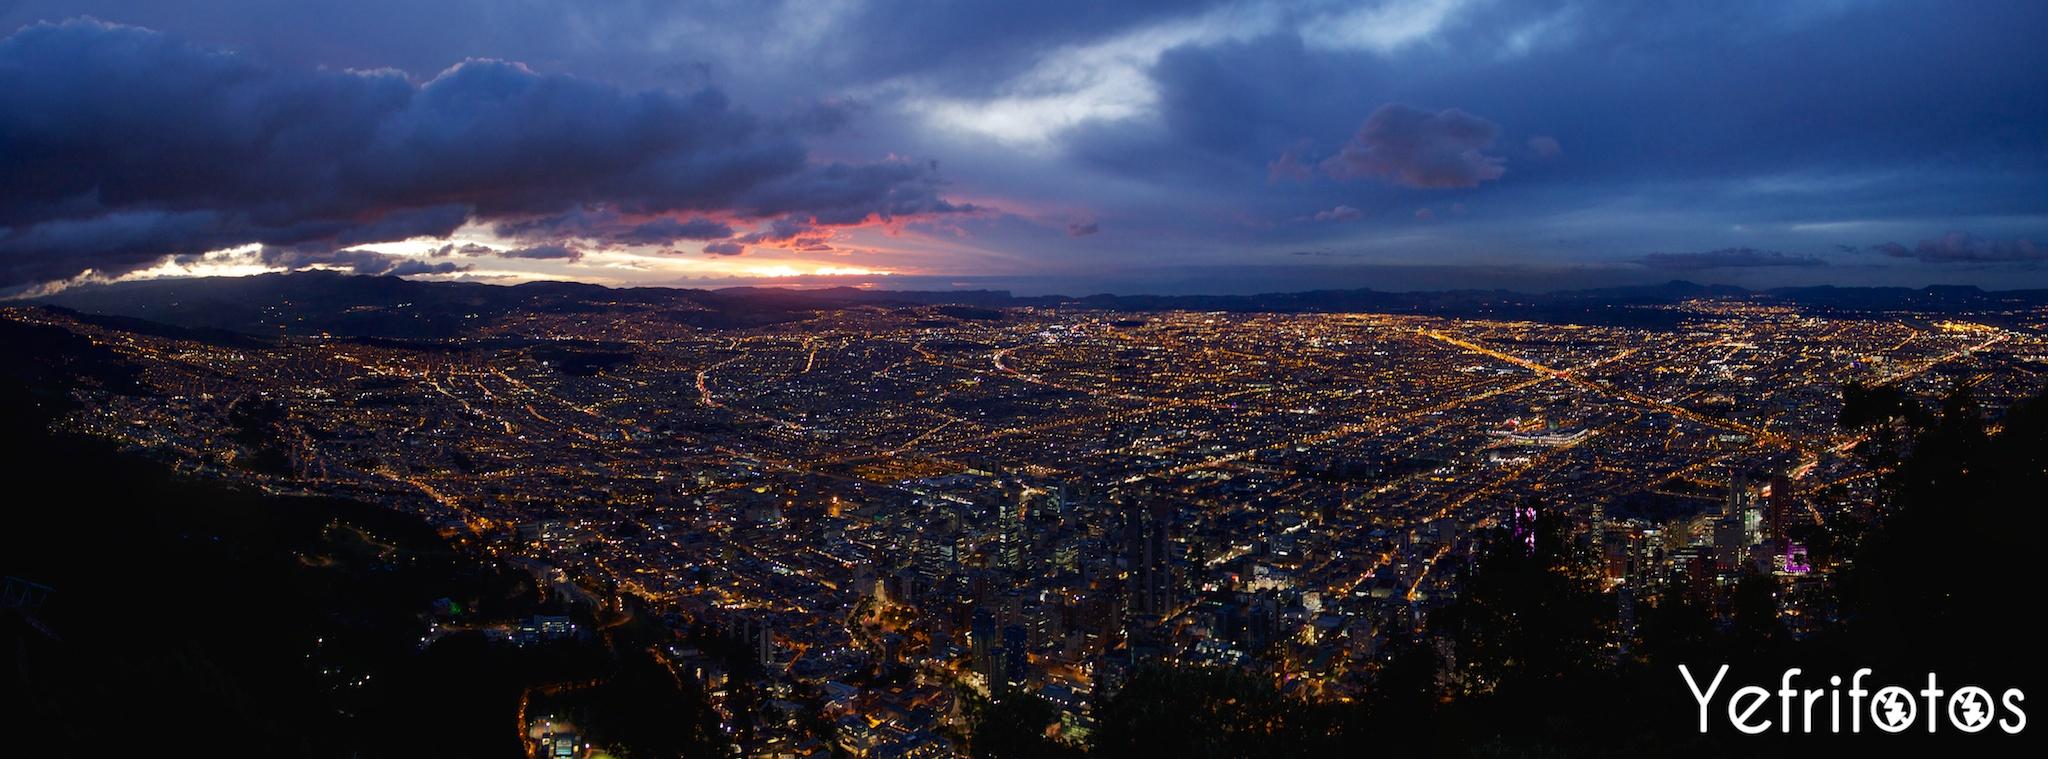 Colombie - Monserrate - Bogota - Panoramica